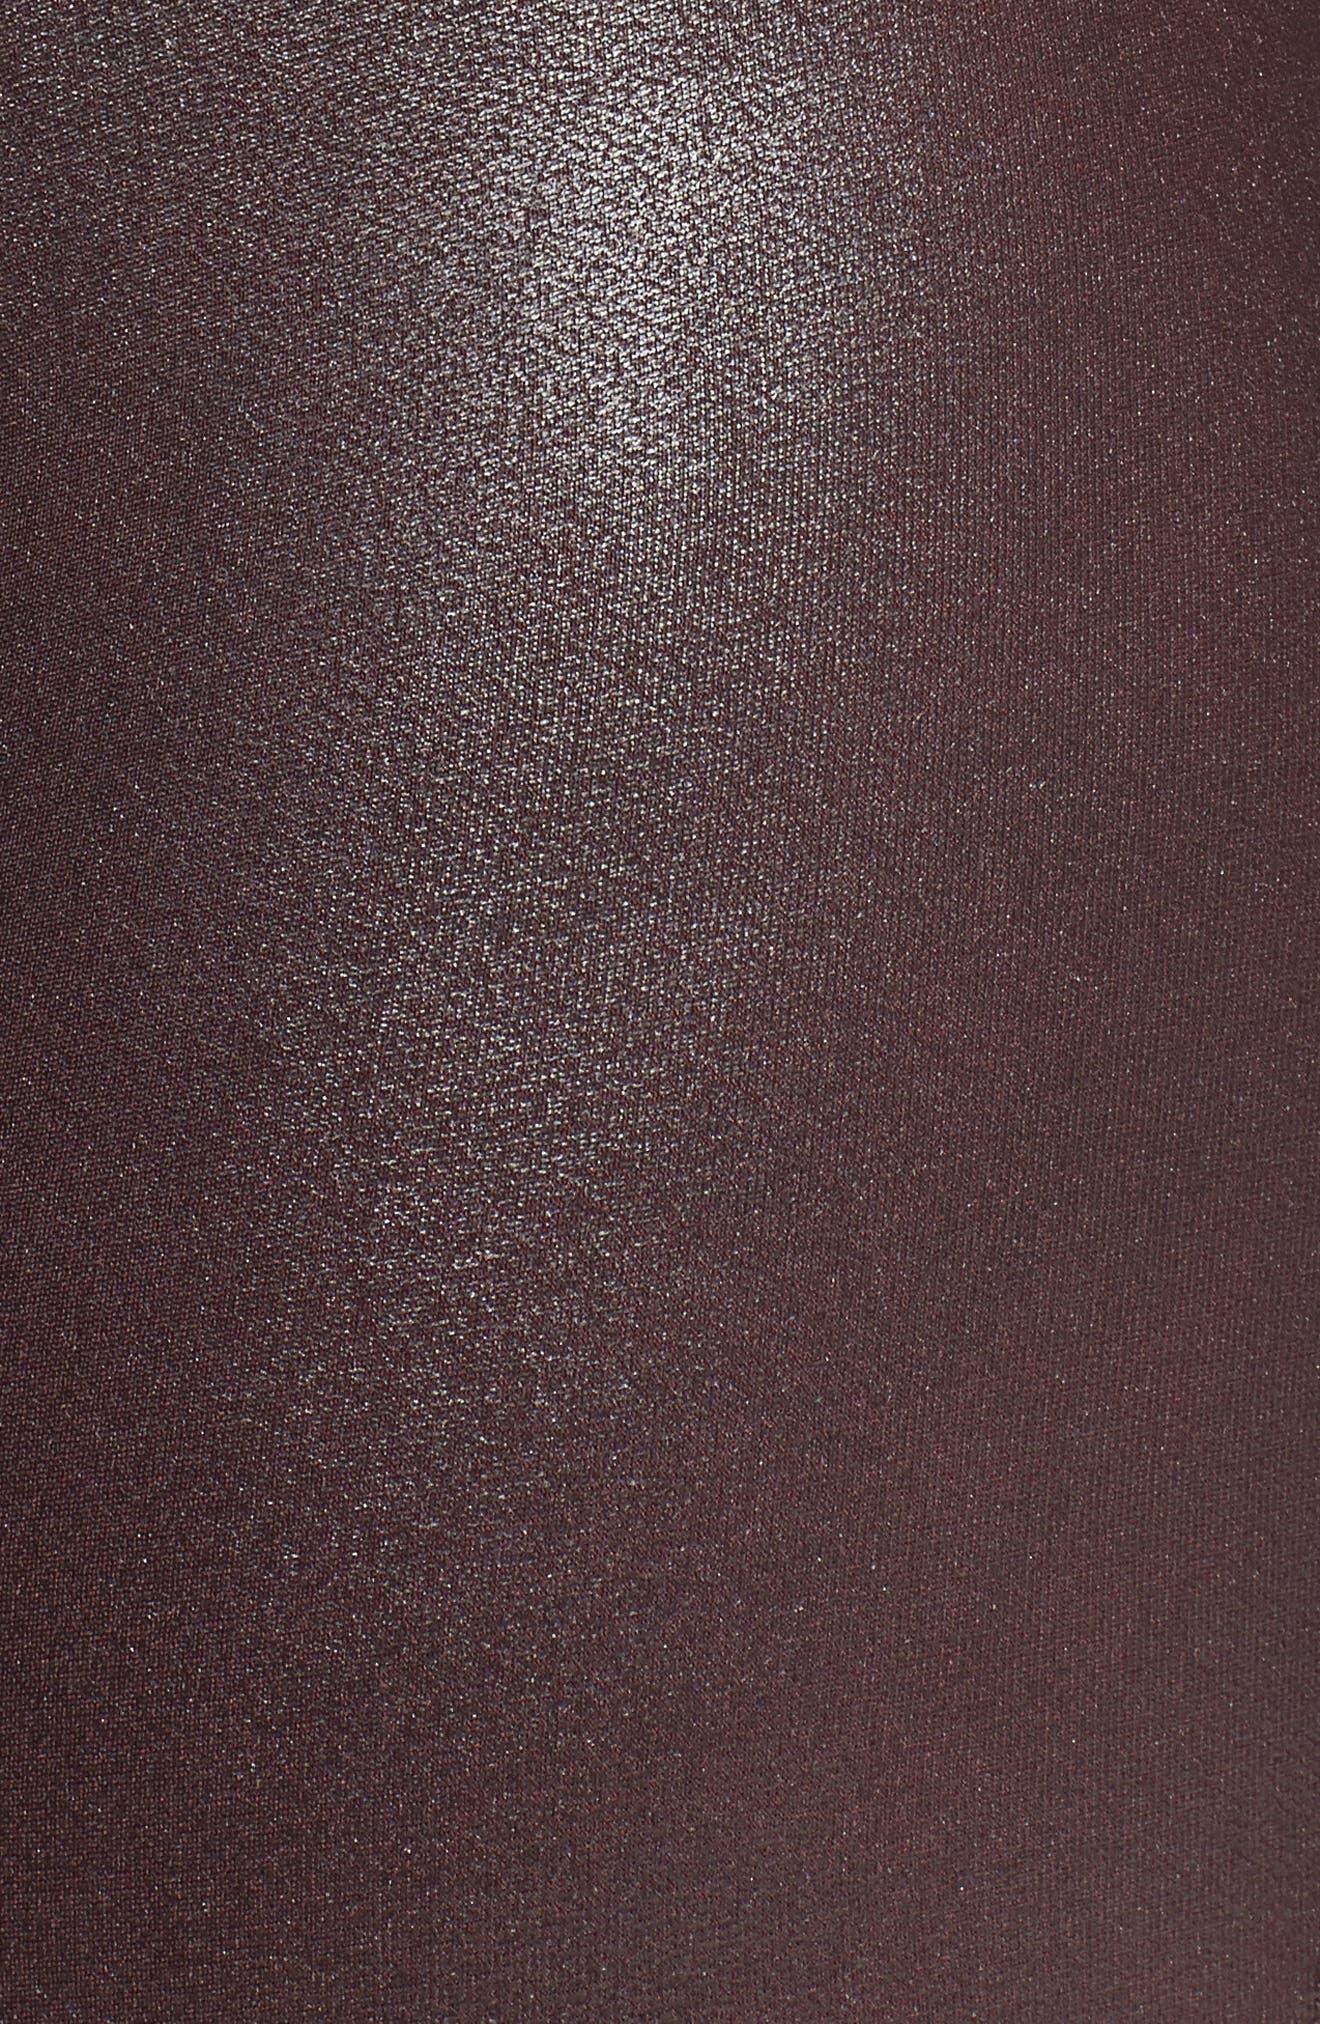 Faux Leather Leggings,                             Alternate thumbnail 7, color,                             Wine